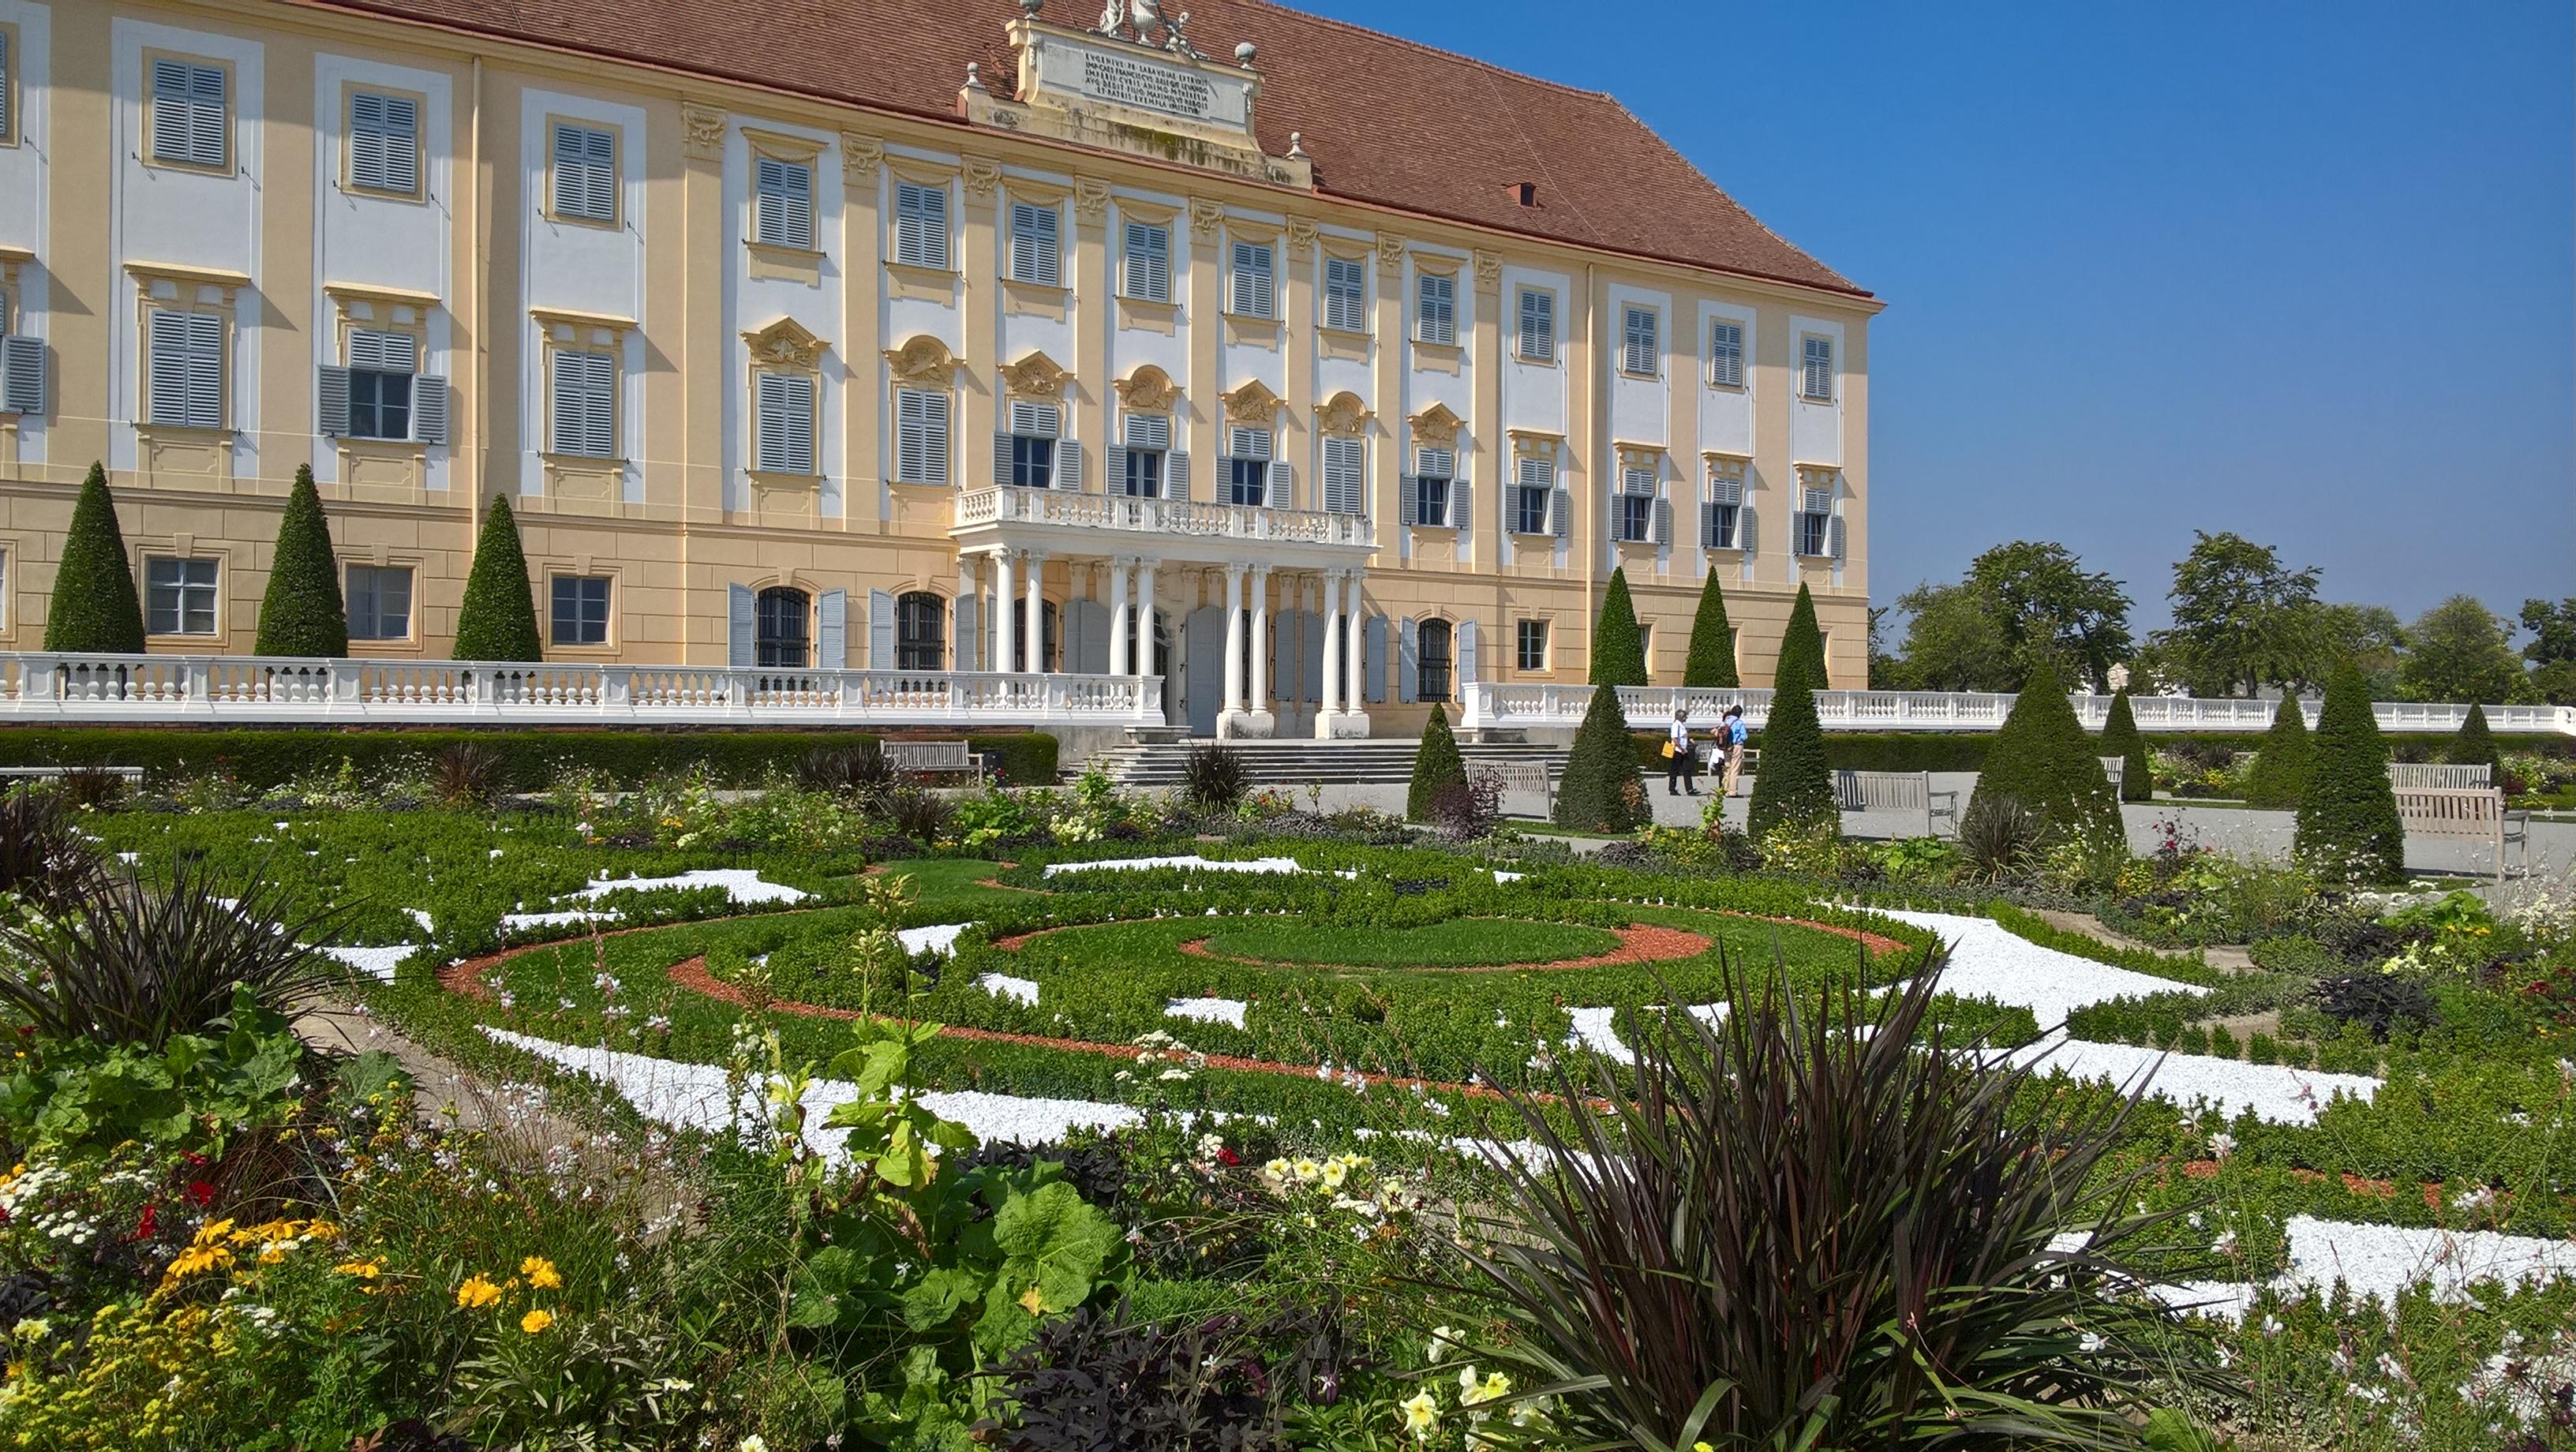 2016.09.15 , 12.WKB, 05 Schloss Hof,